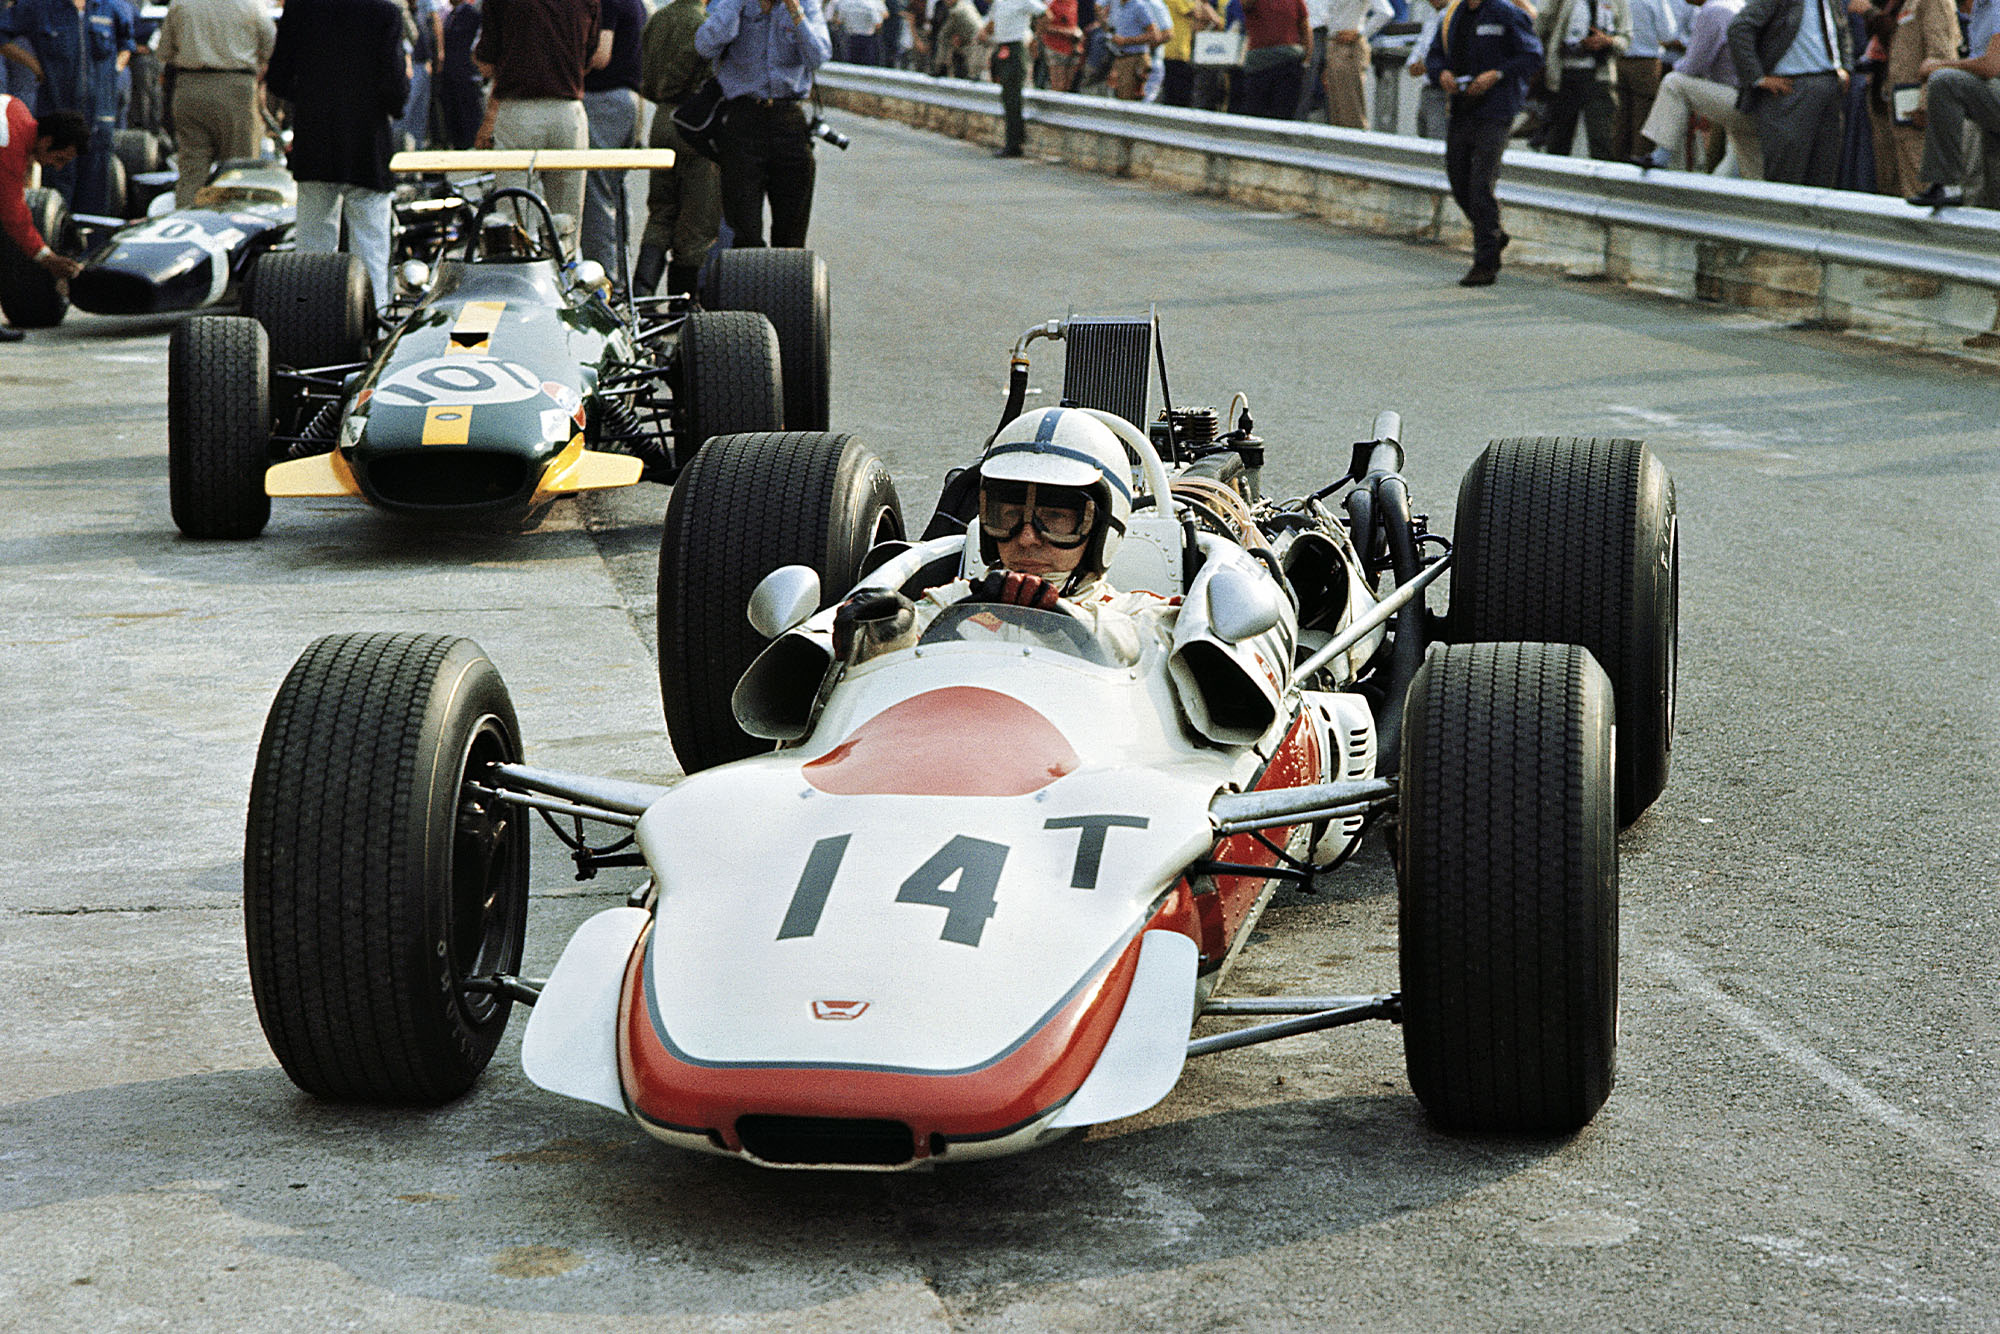 John Surtees, Honda RA301 in front of the Brabham BT26 Repco.